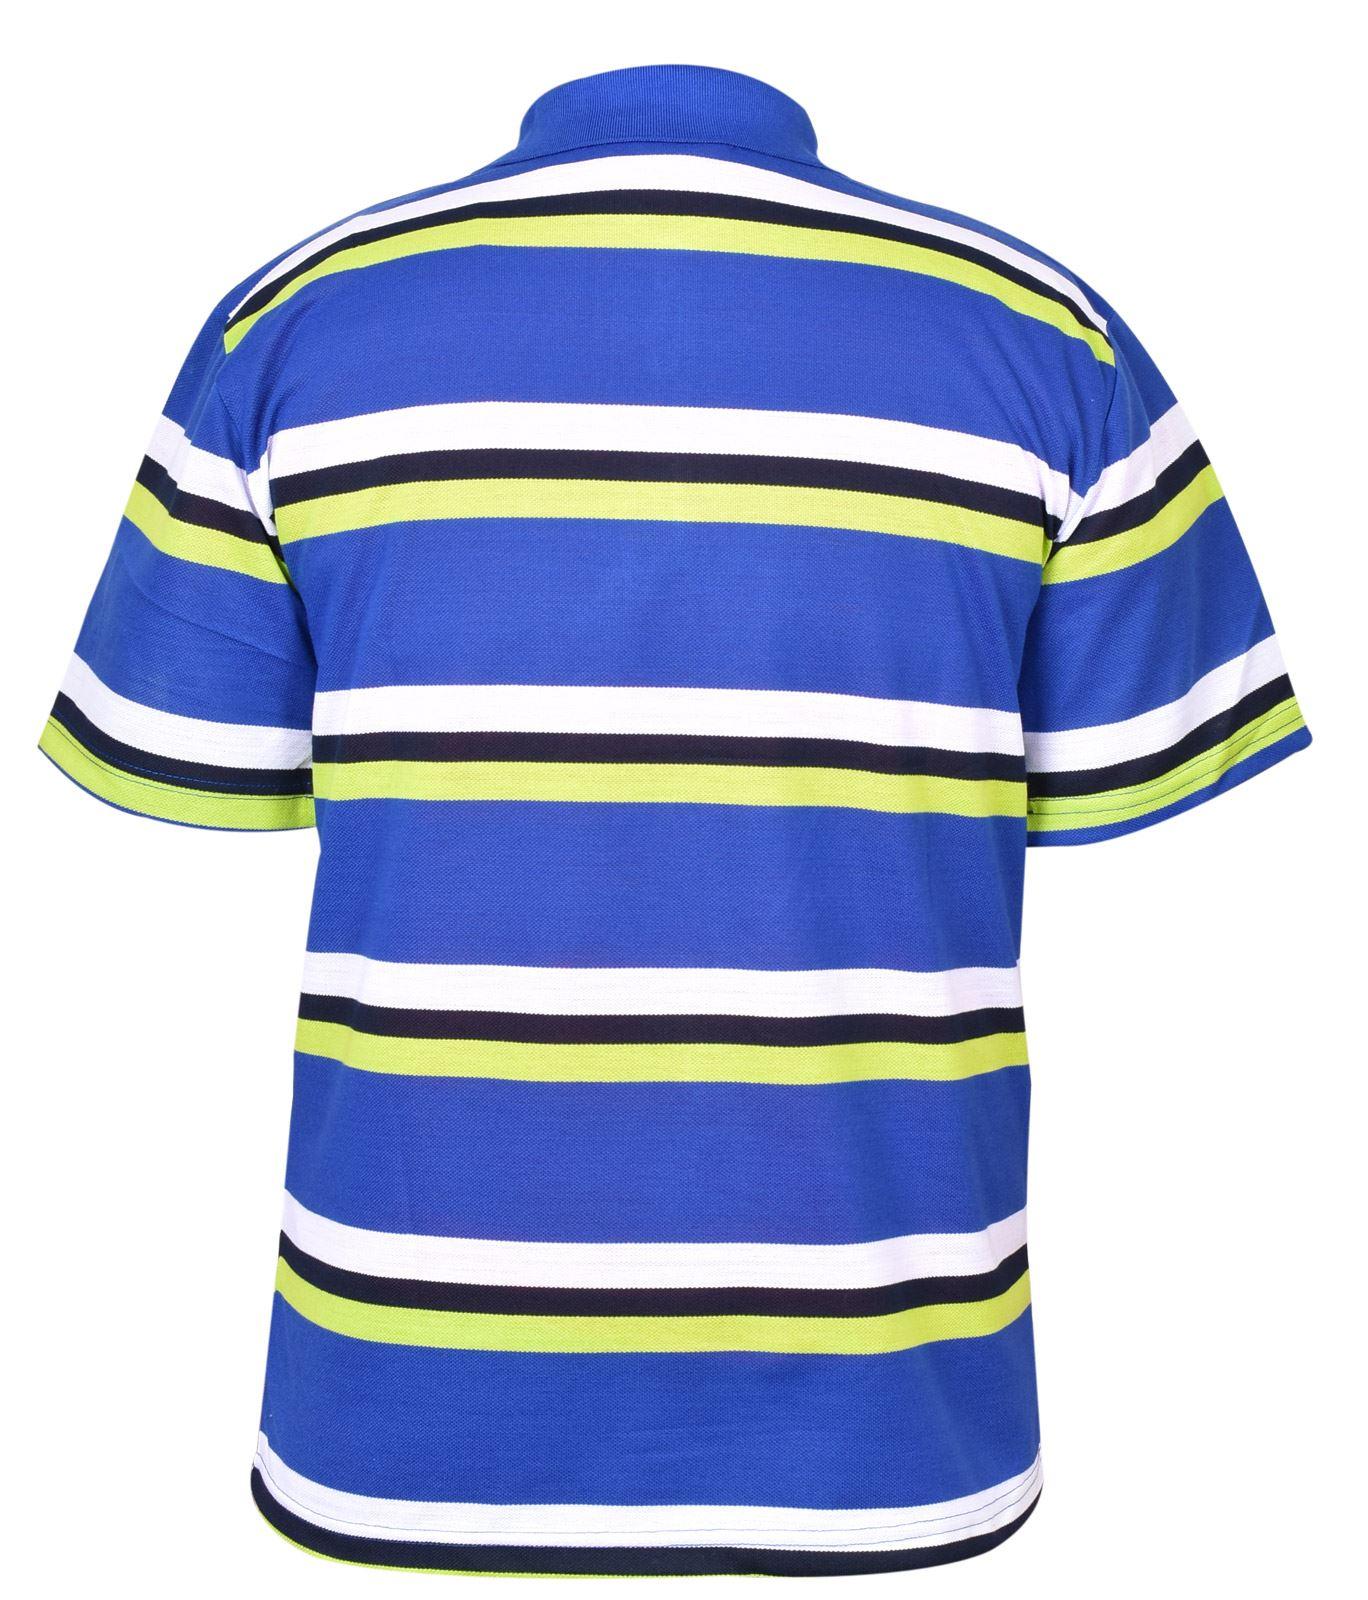 Mens-T-Shirts-Yarn-Dyed-Strip-Pocket-Polo-Shirt-Top-Multi-Colour-Size-M-3XL thumbnail 38